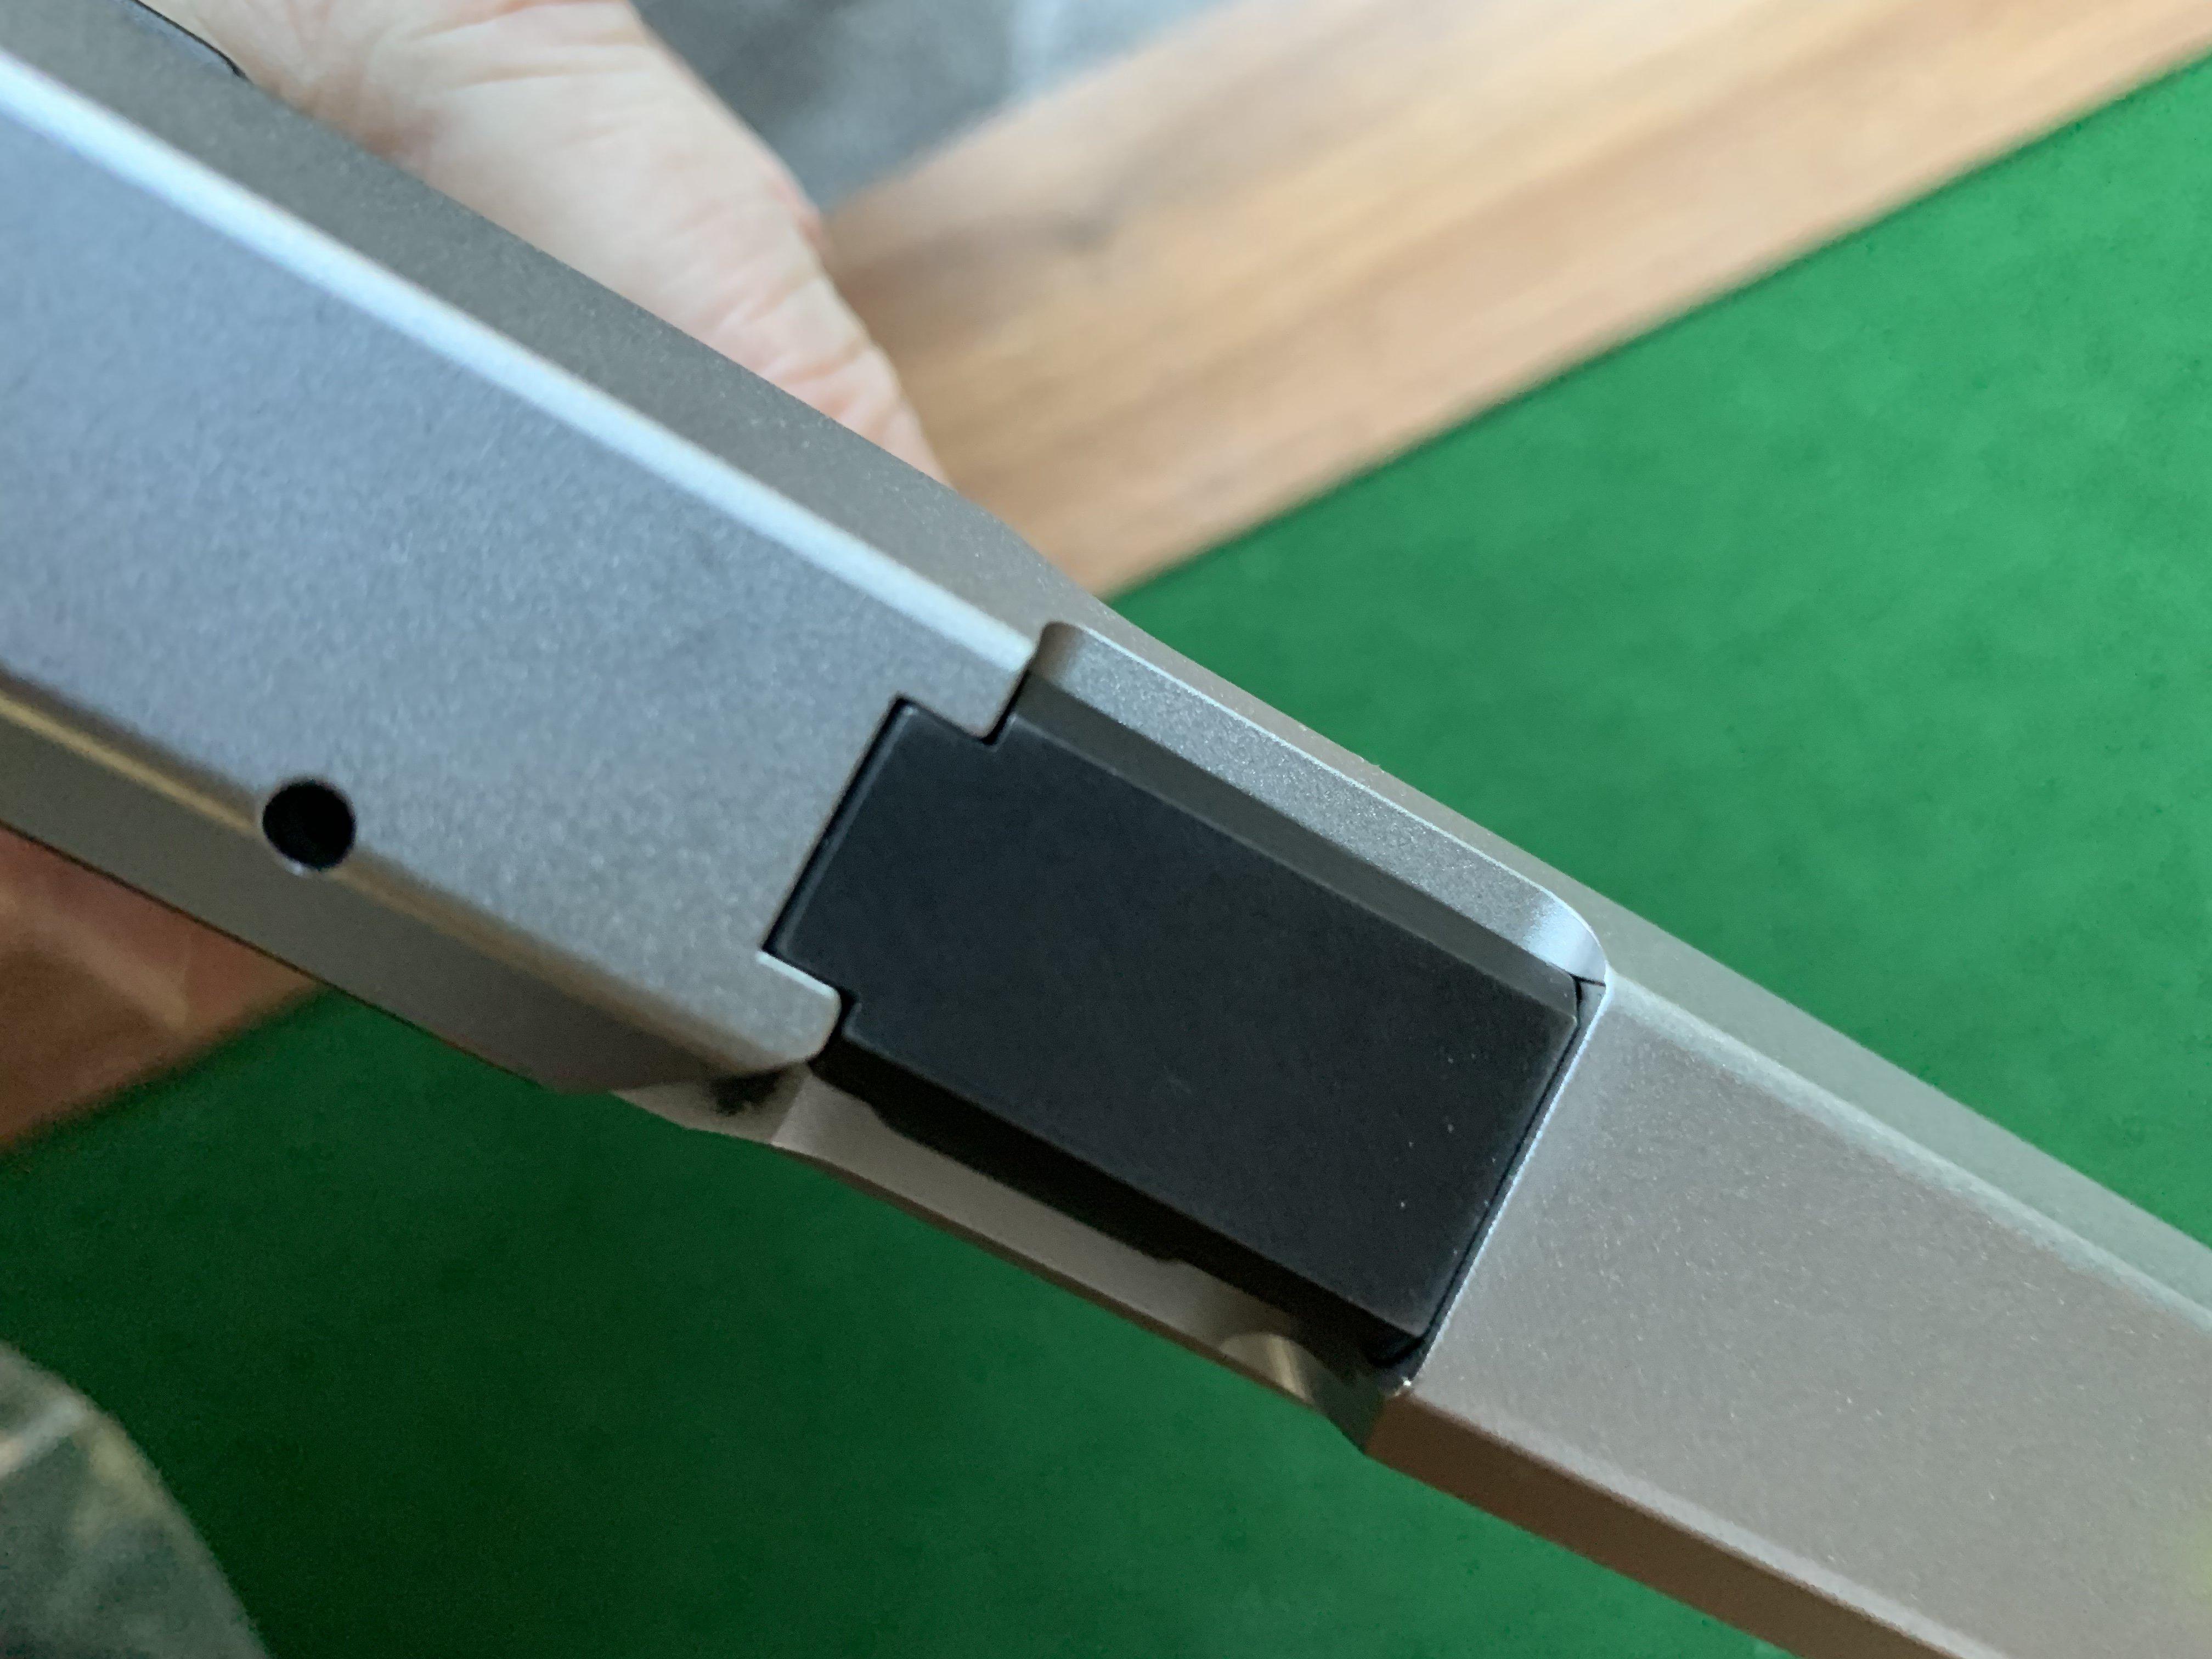 WTS: HK USPC 9mm SS Slide + SOLD - SOLD-usp-9mm-ss-parts-6-.jpeg